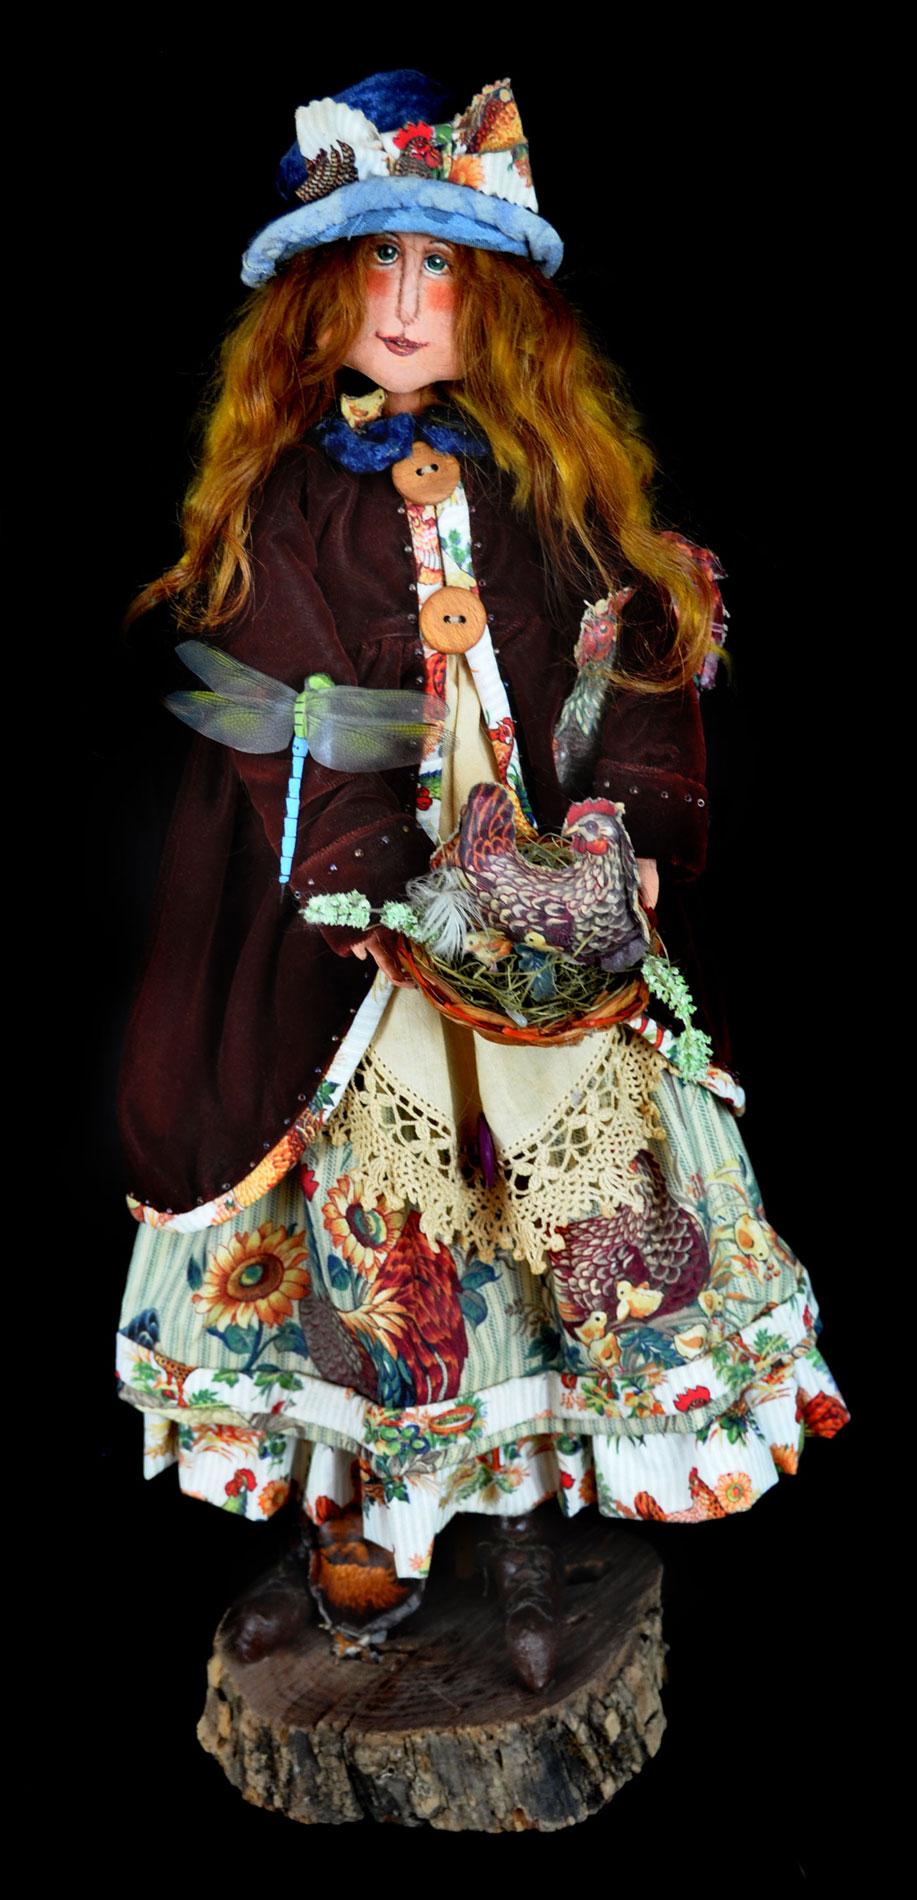 Sandys Doll - Handmade Dolls Online